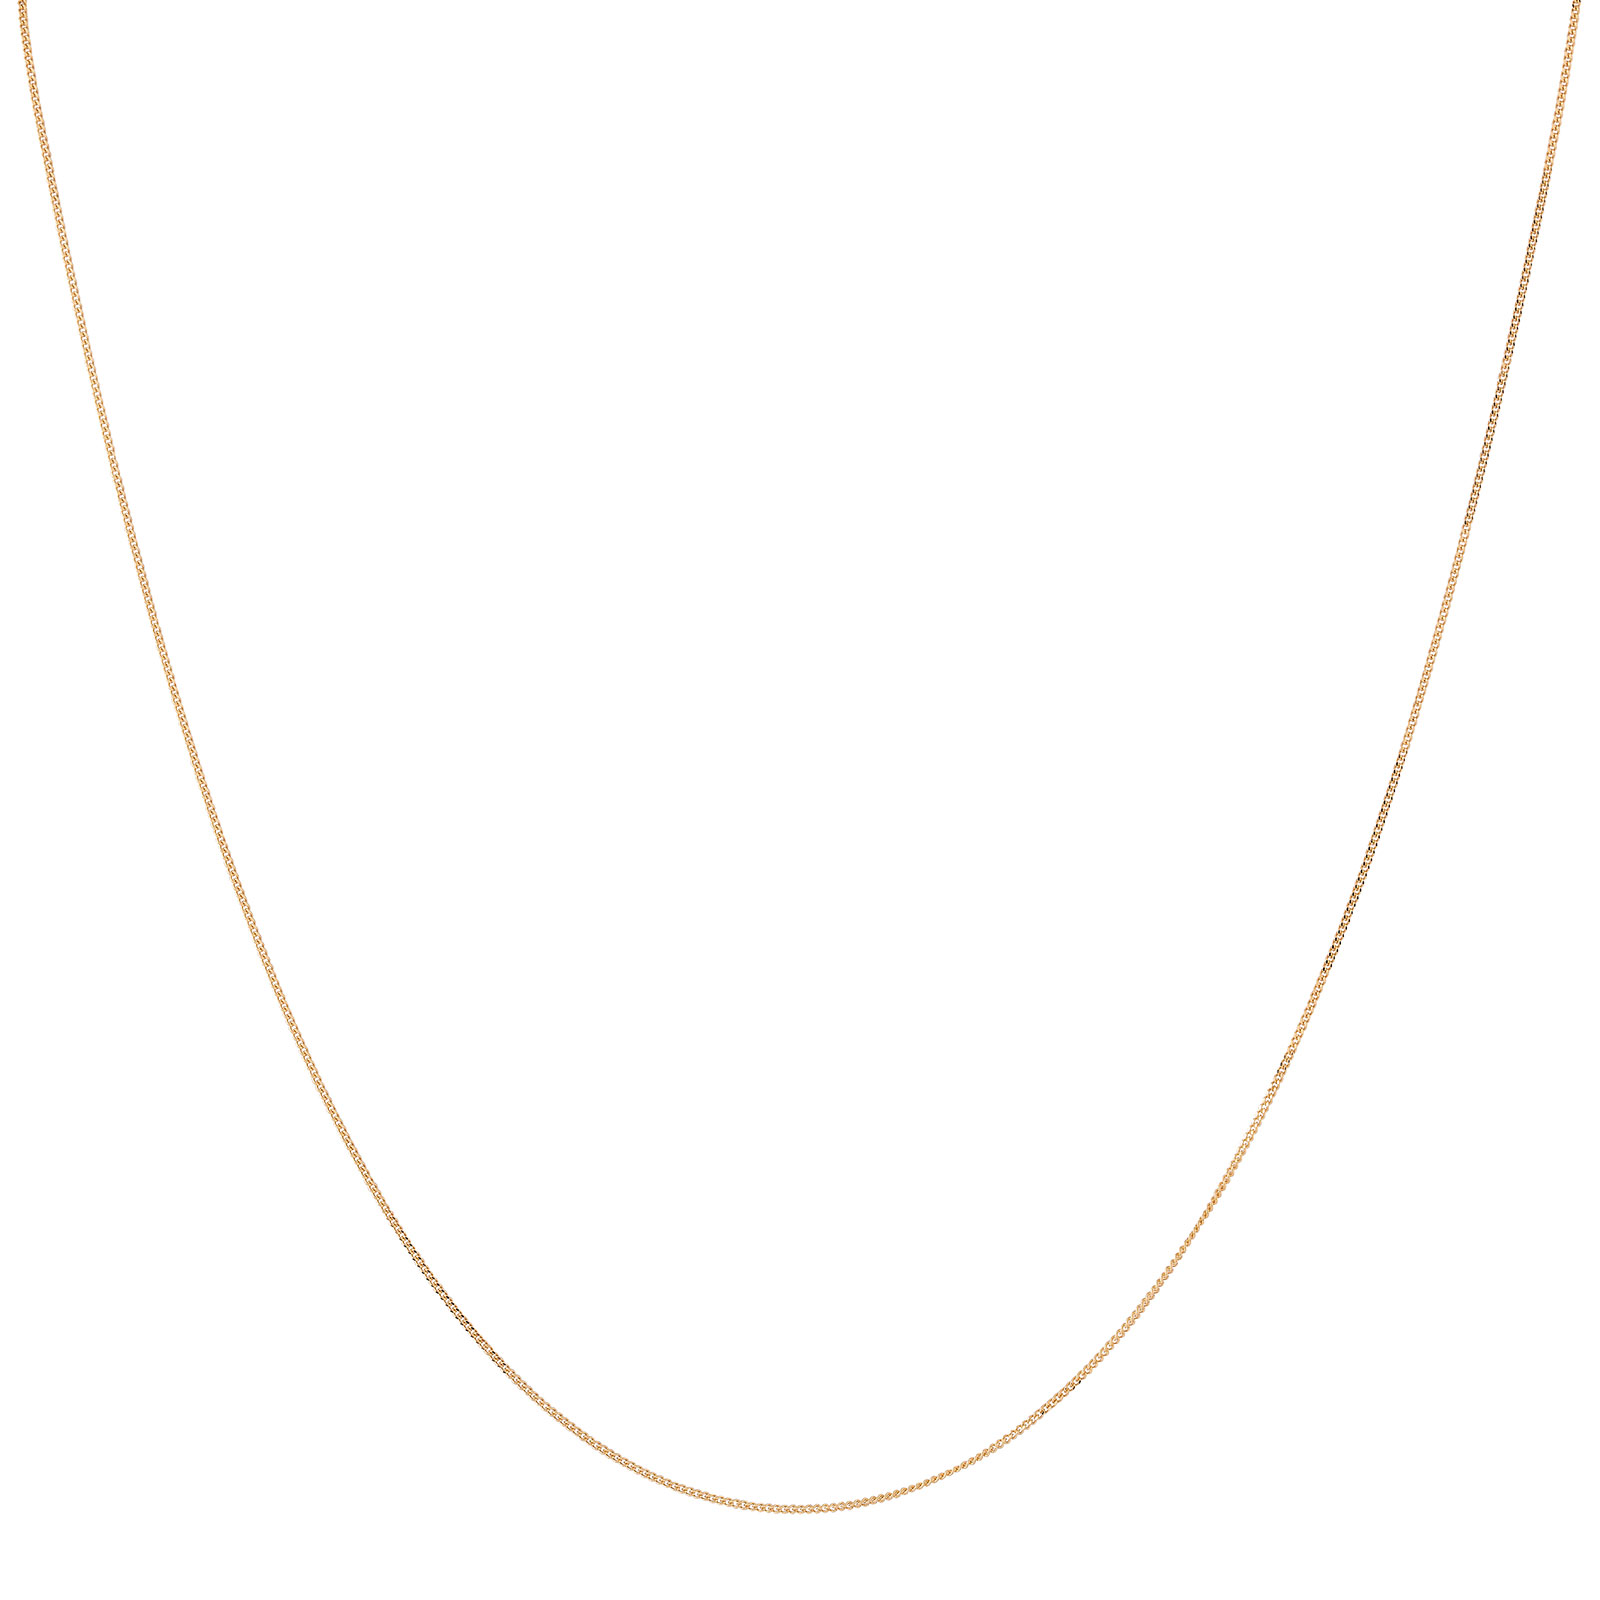 Halsband 18k guld - Pansarlänk 45+5 cm